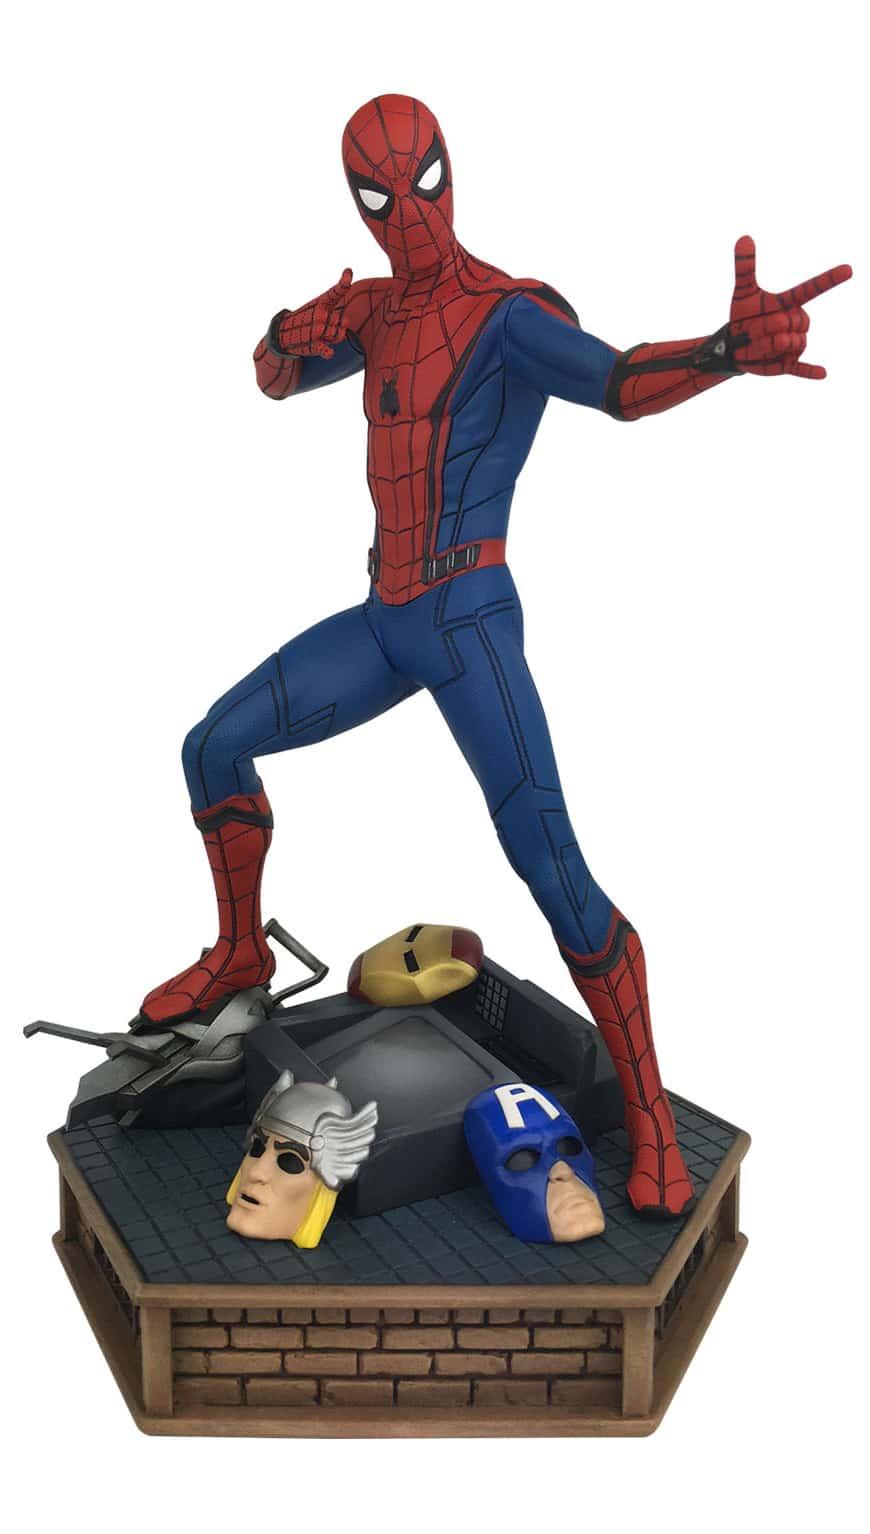 SPIDER-MAN HOMECOMING MOVIE ESTATUA 30,5 CM MARVEL PREMIER COLLECTION